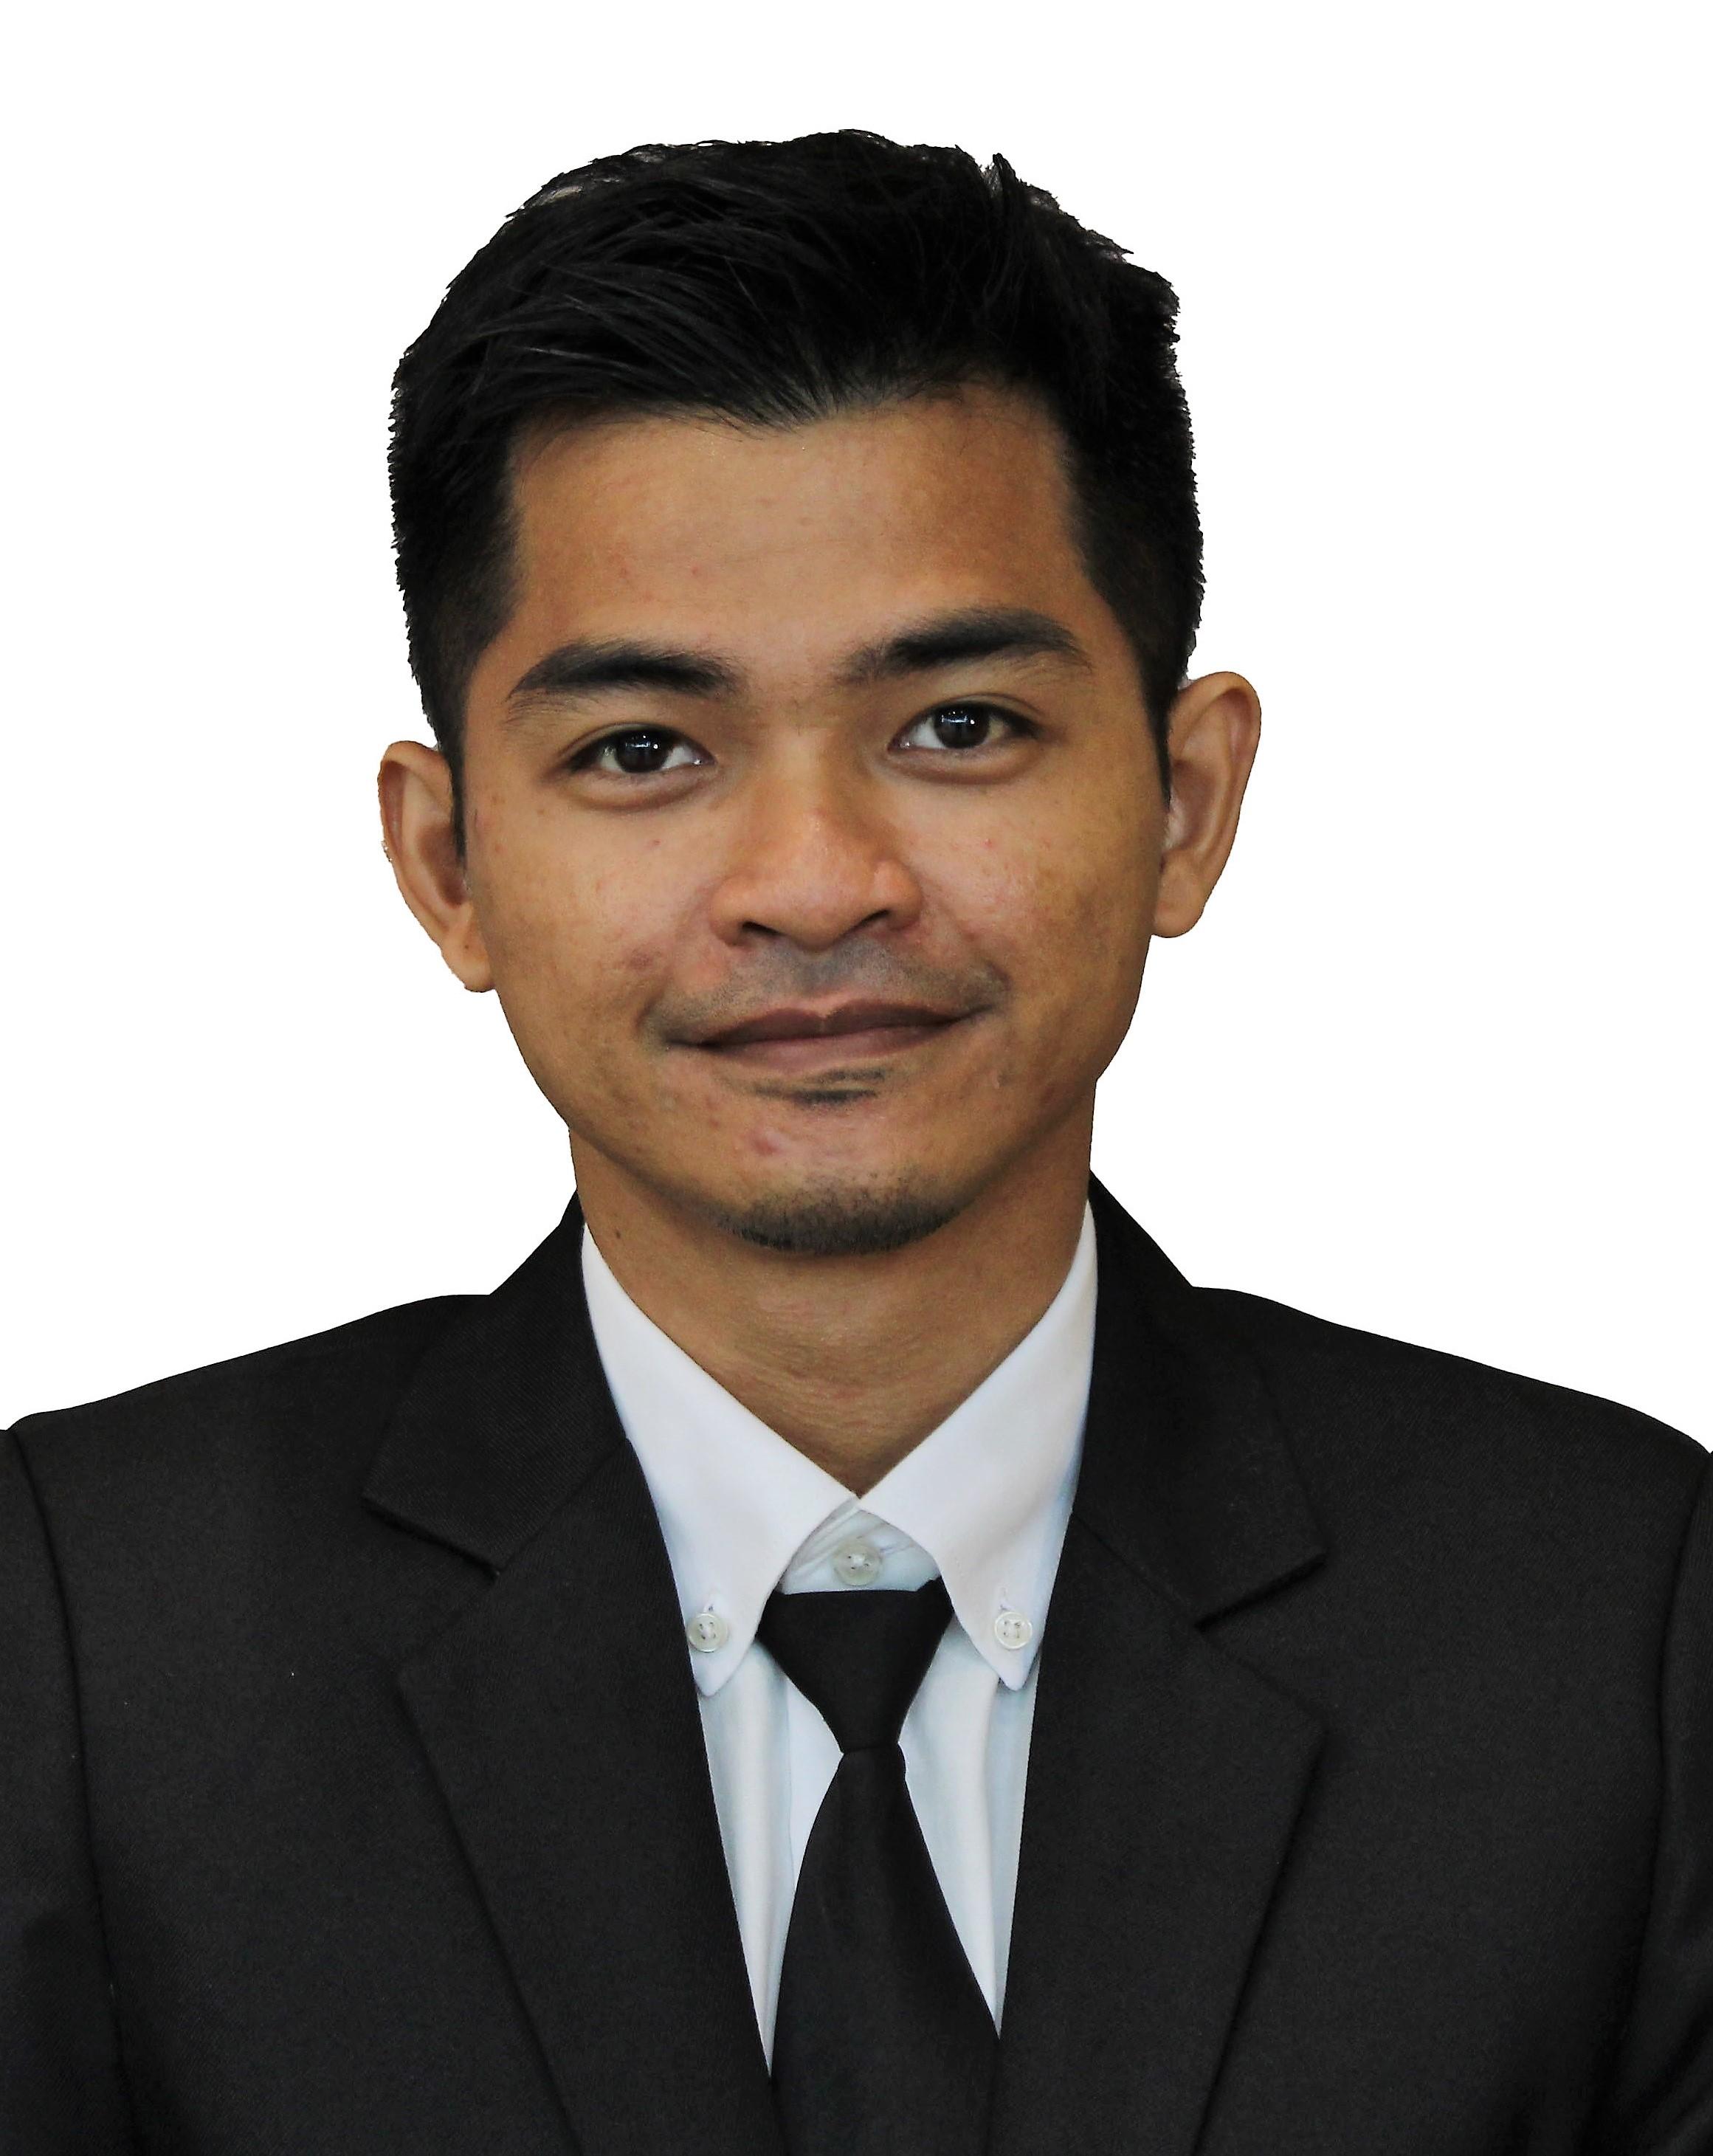 Nurafrina Azira Binti Hamdan Tahir